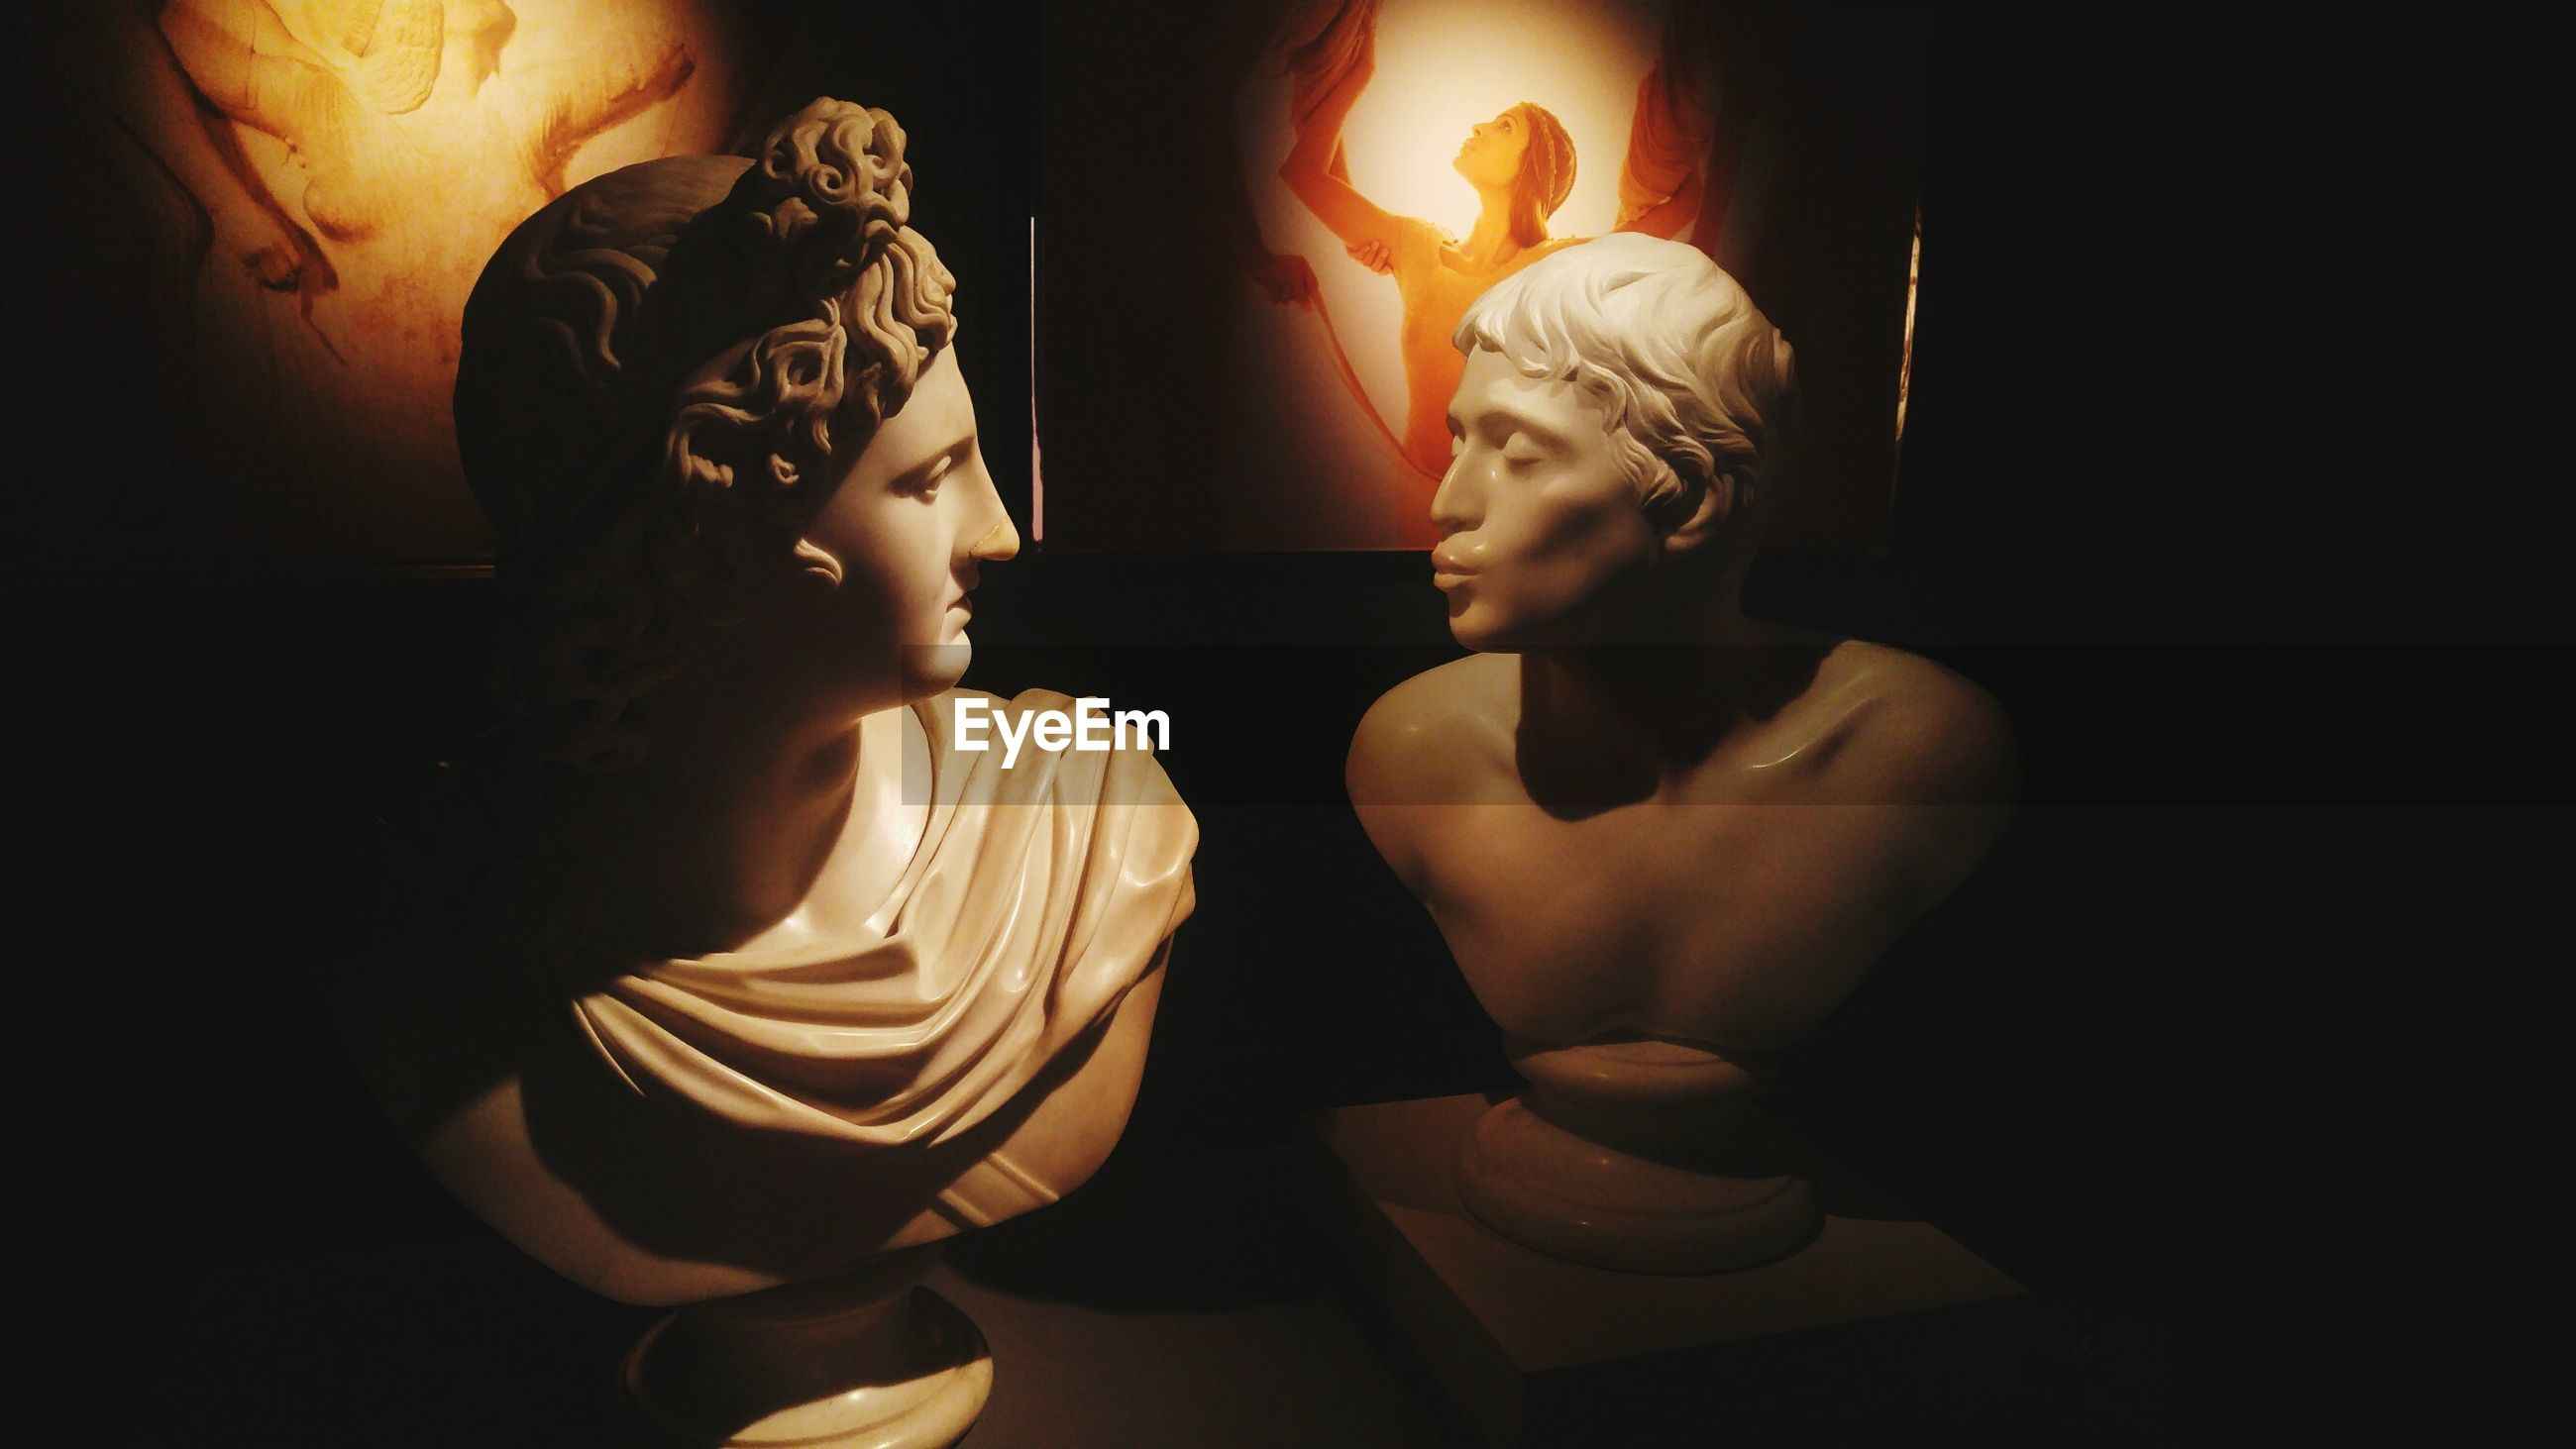 human representation, female likeness, illuminated, indoors, statue, no people, sculpture, studio shot, black background, close-up, day